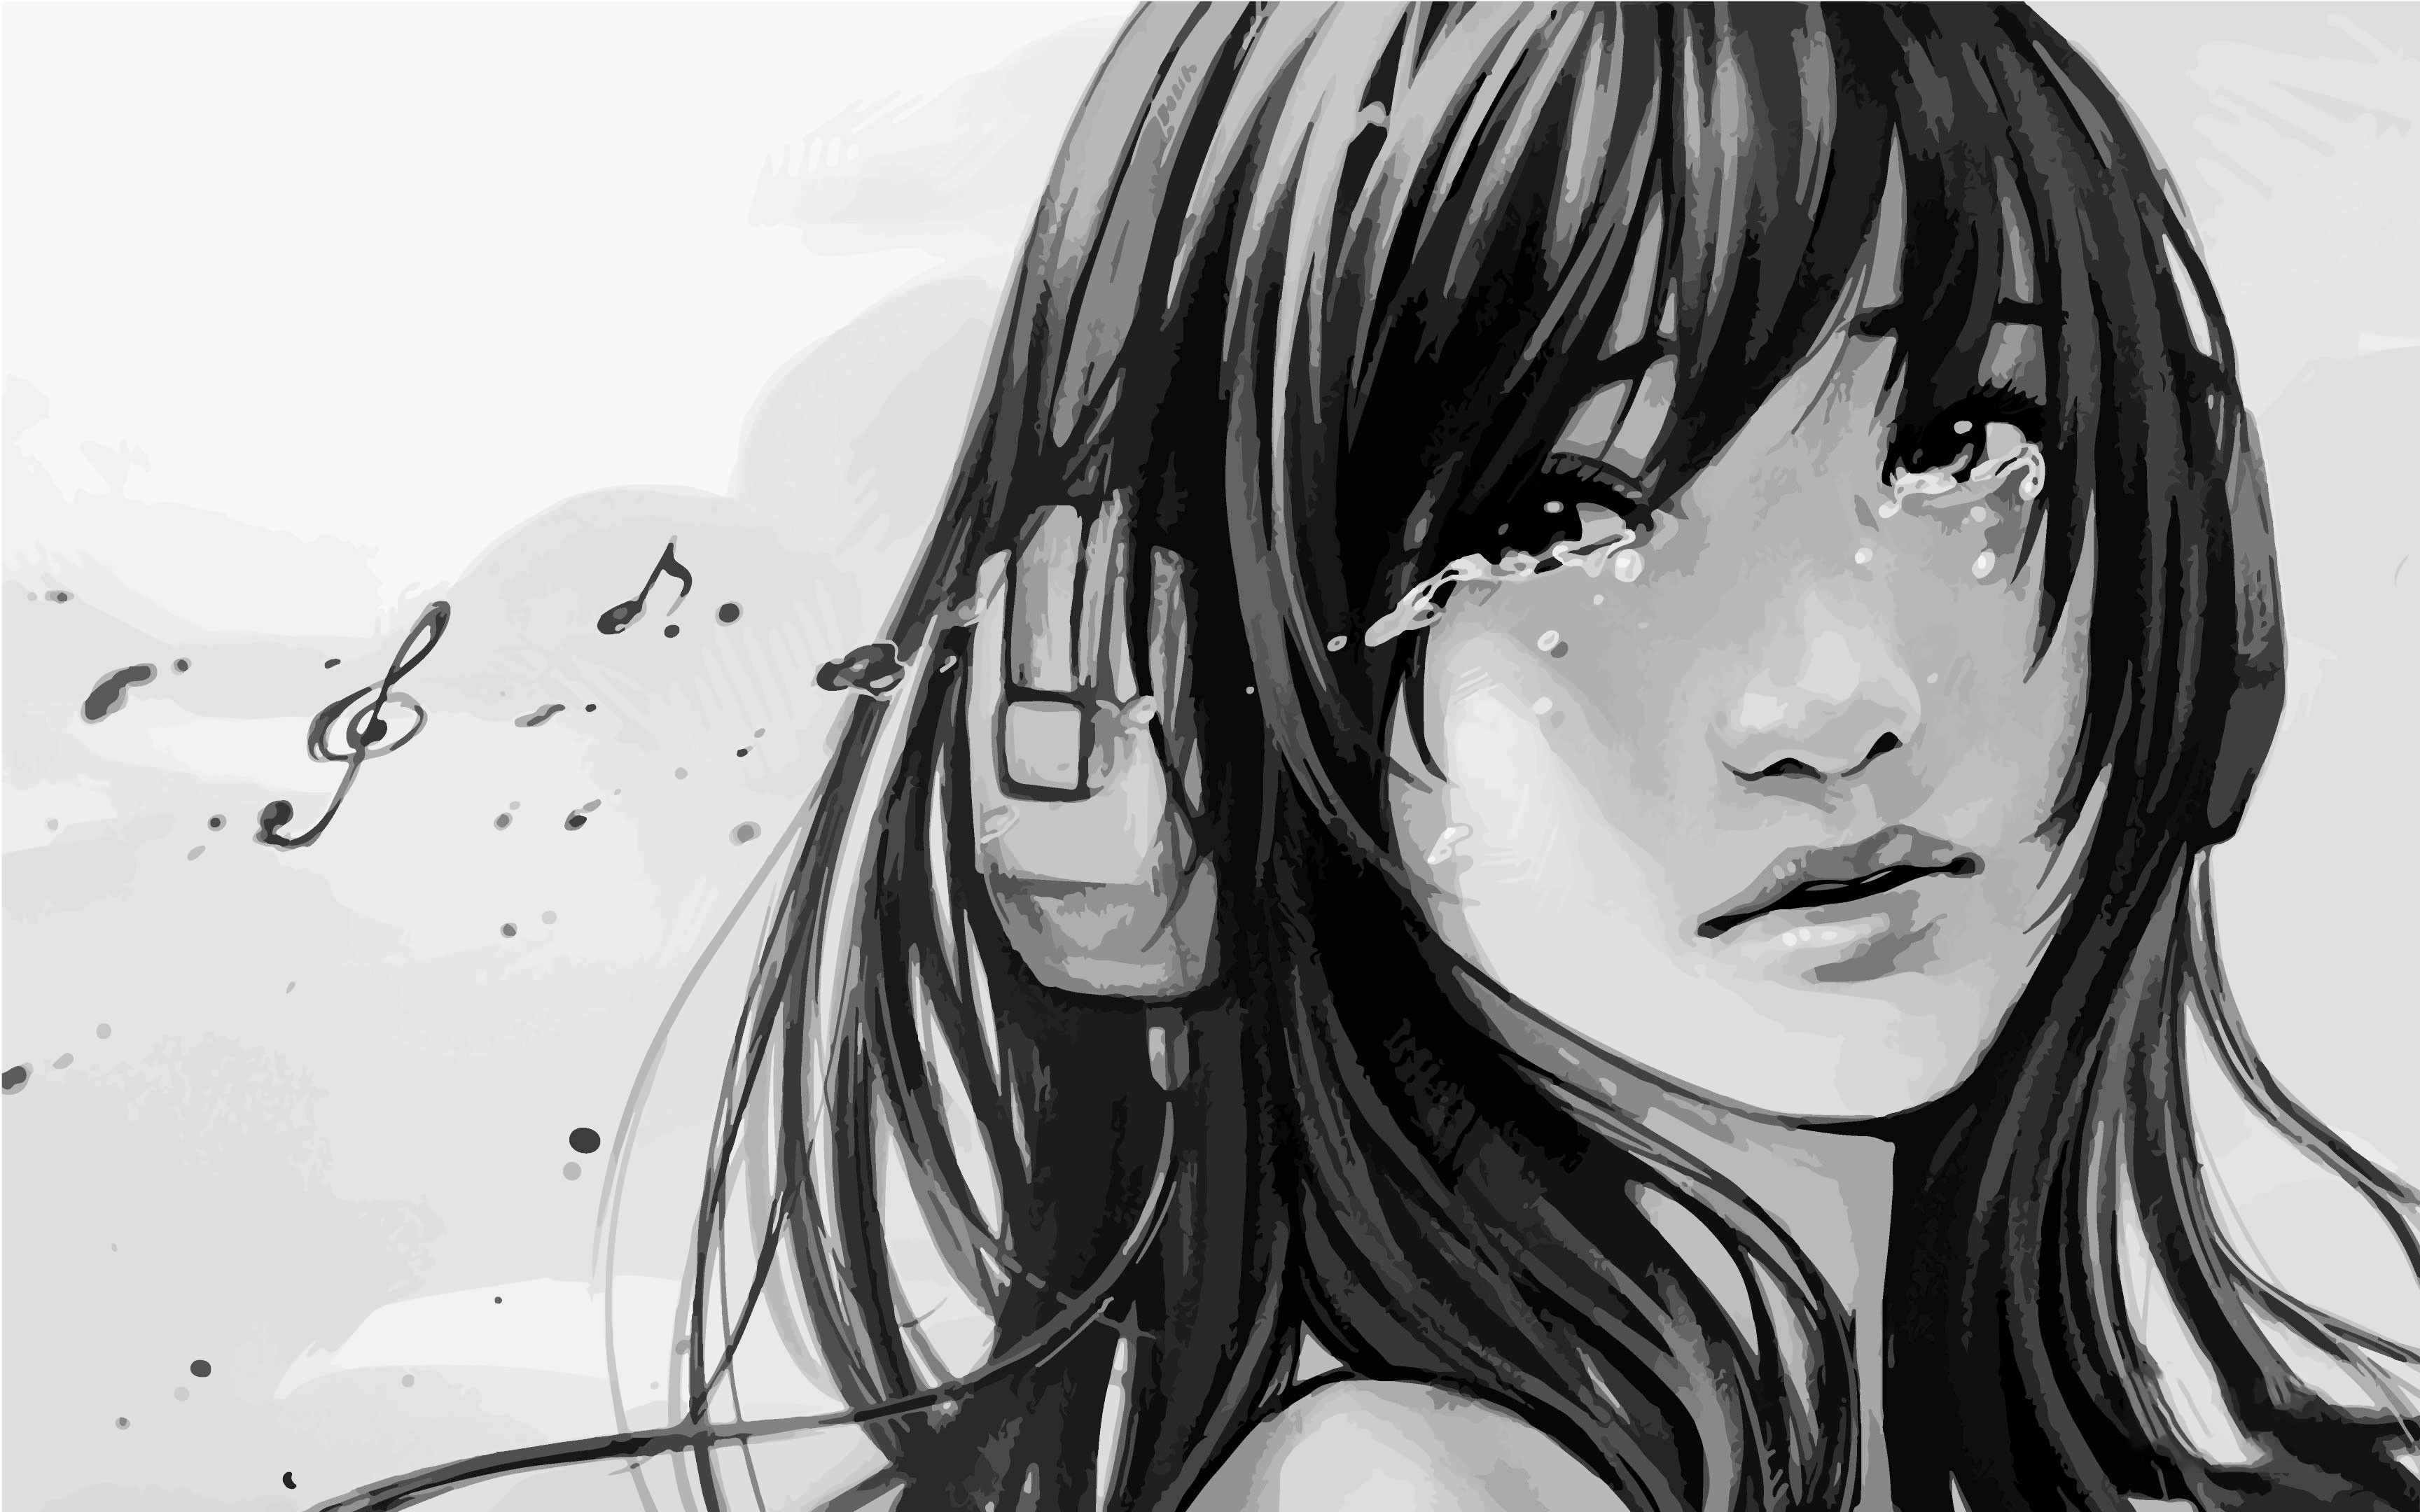 Anime Broken Heart Girl Painting Wallpapers Wallpaper Cave